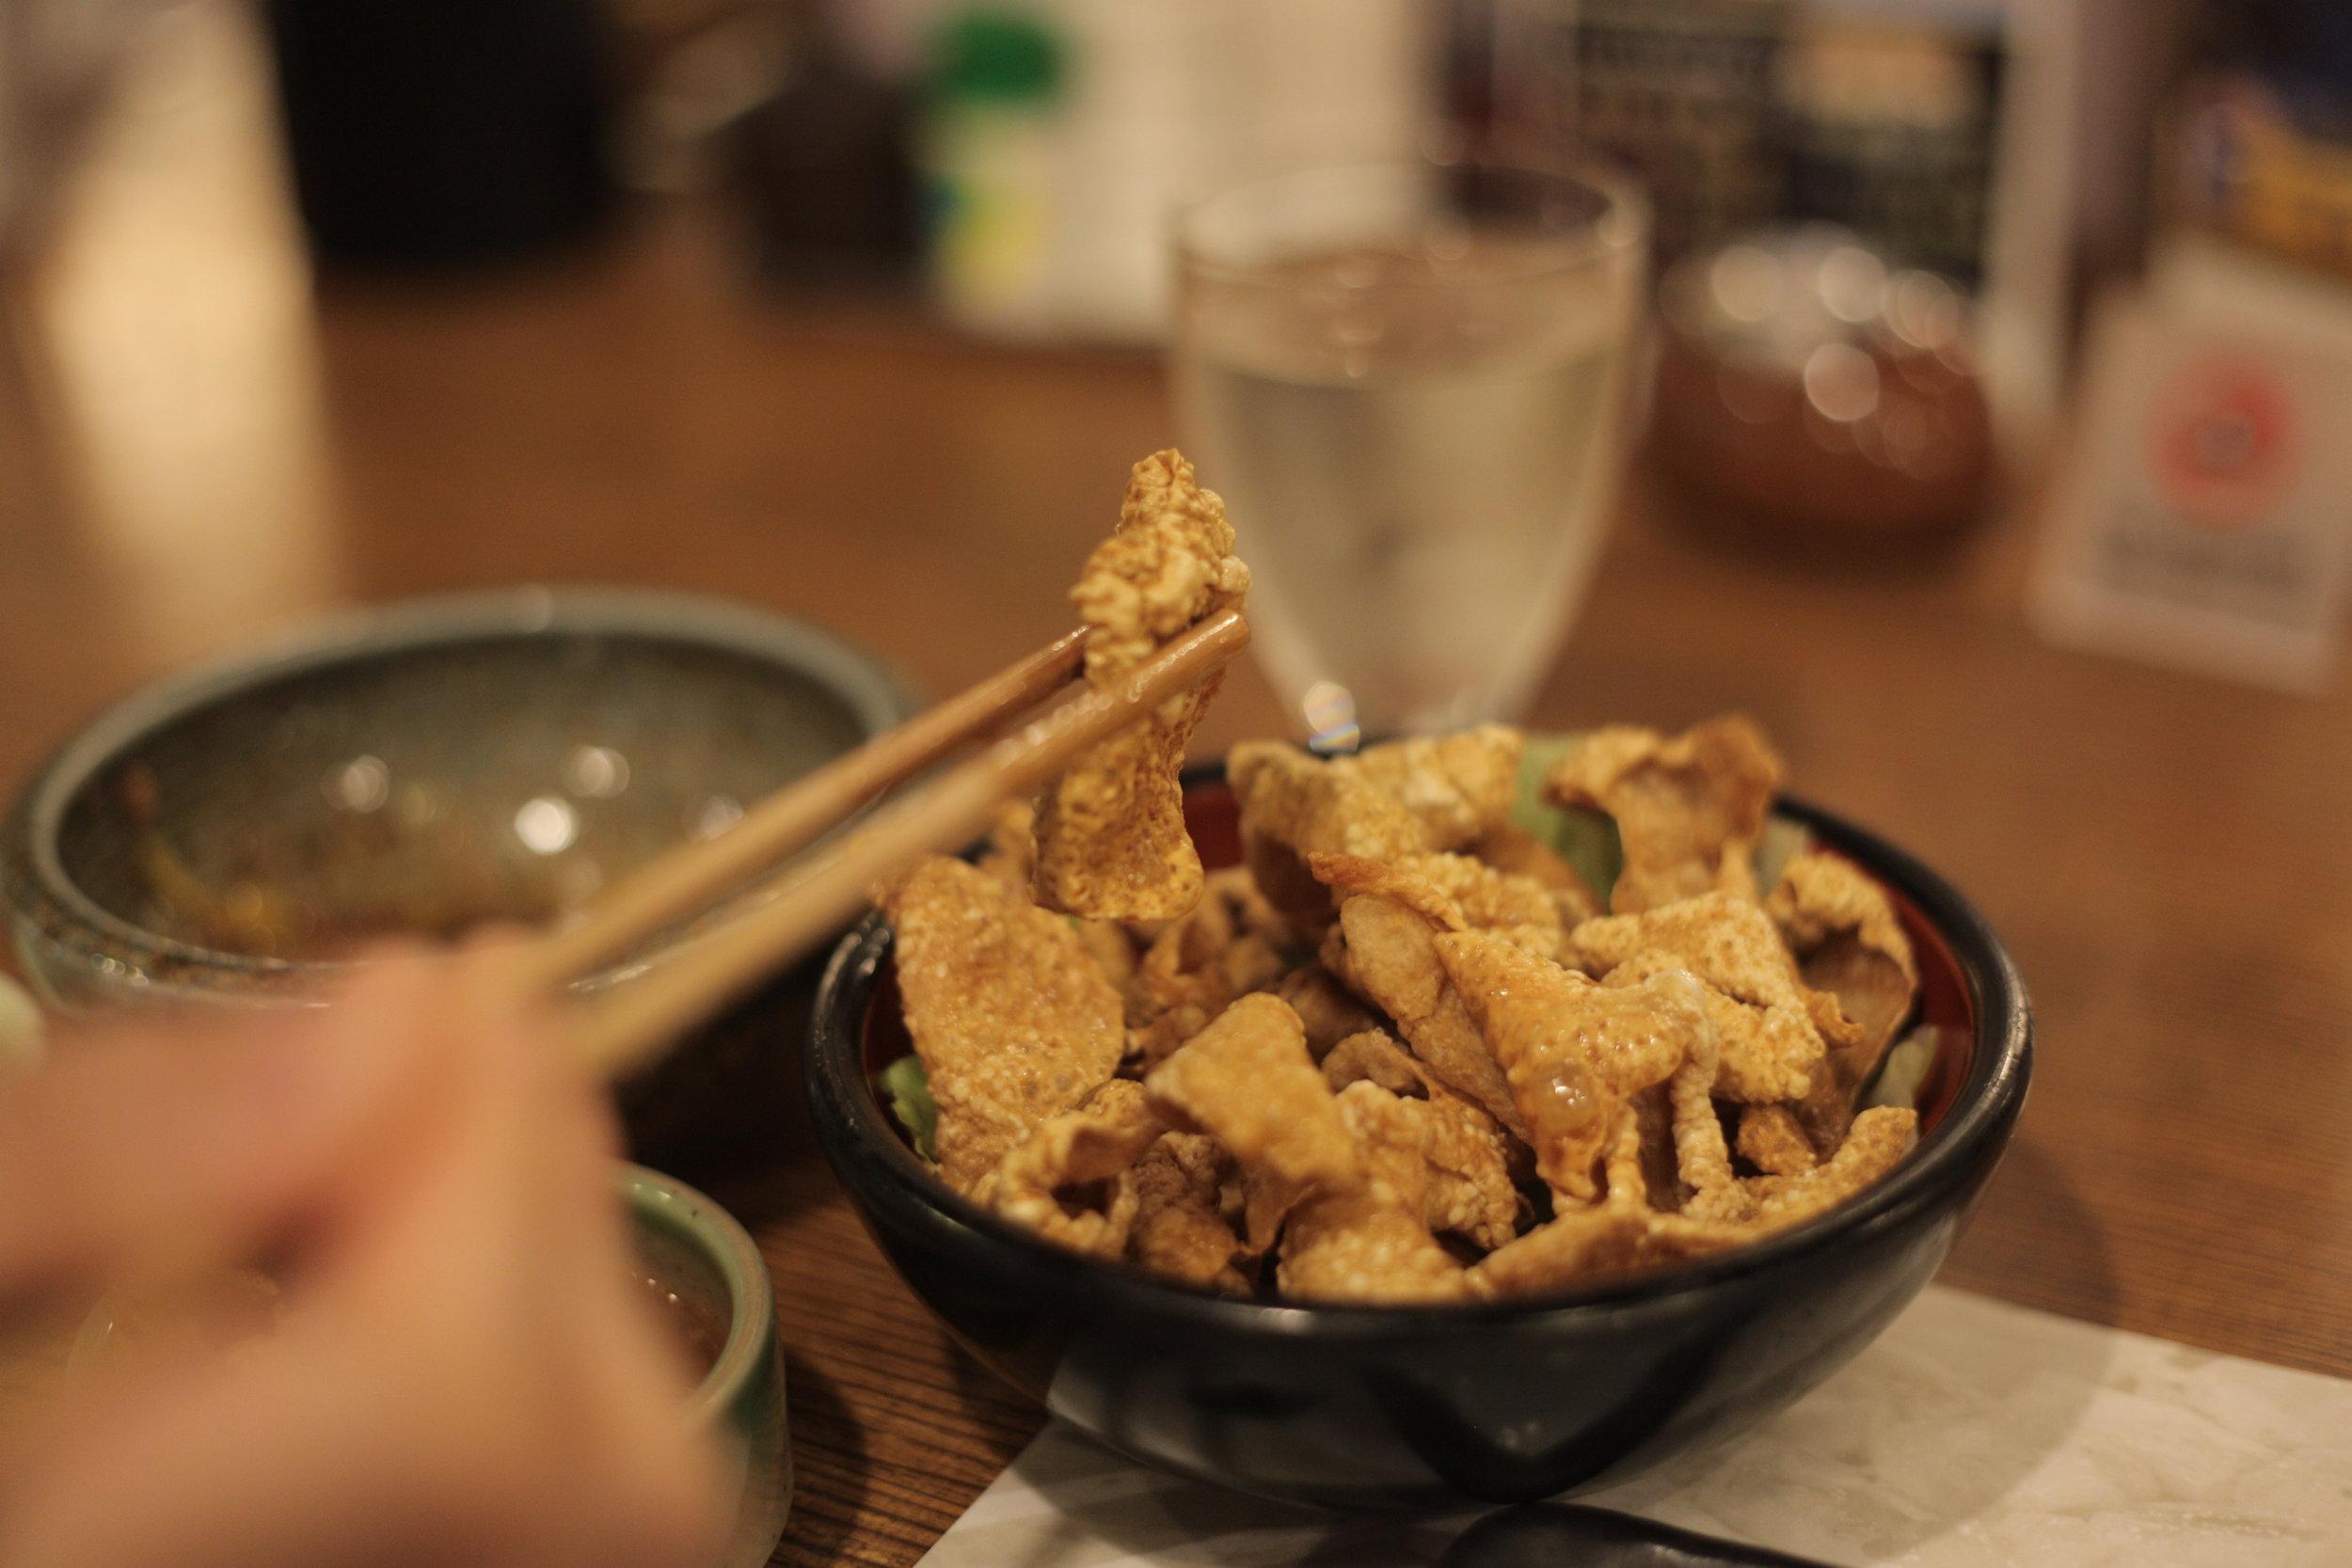 Crispy chicken skin at Torisei